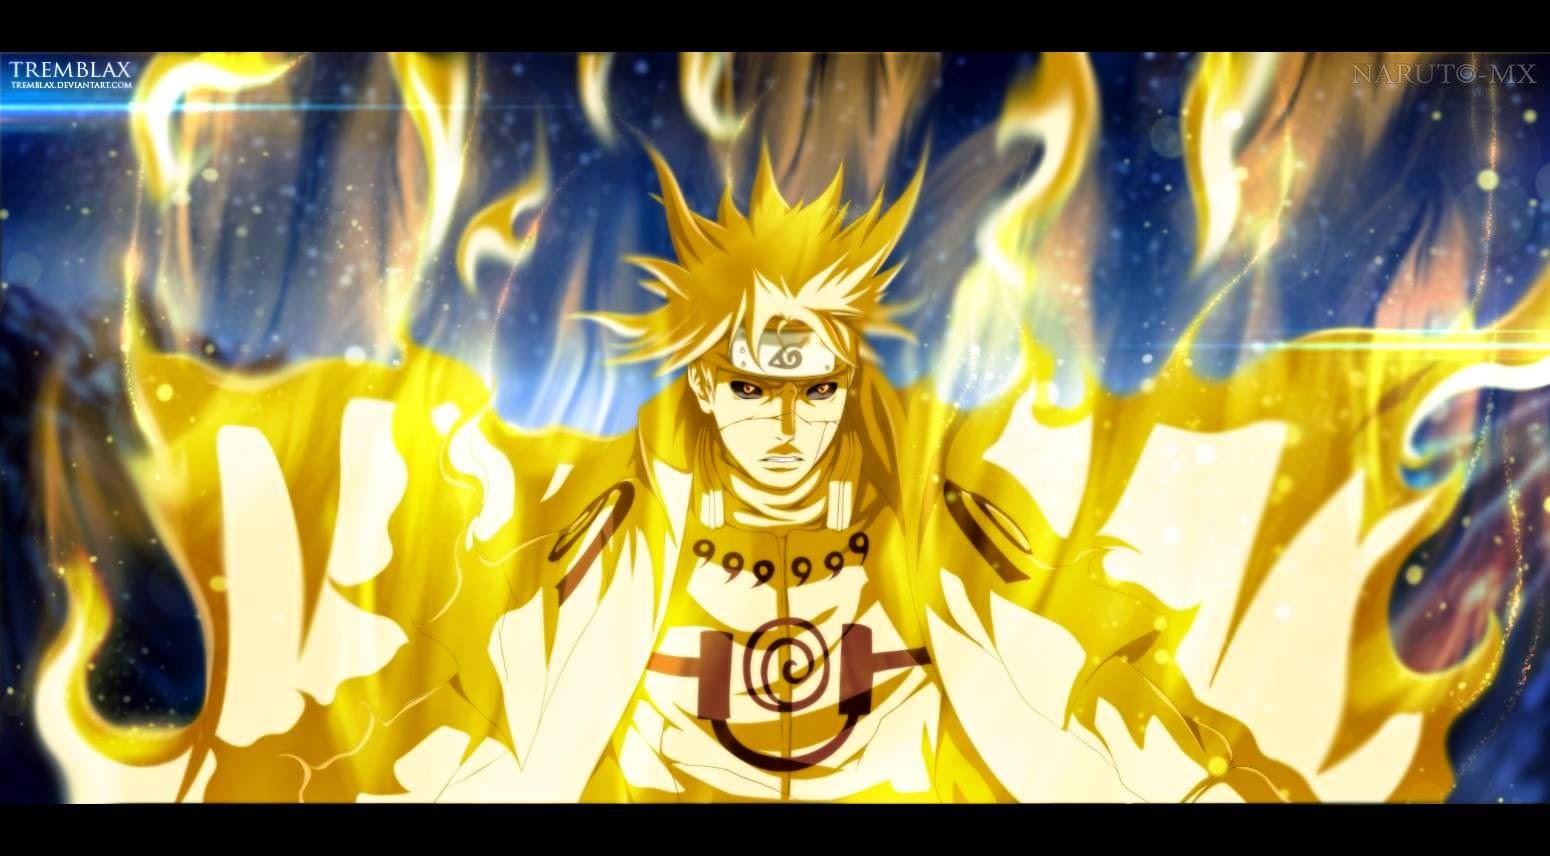 Wonderful Wallpaper Naruto Gambar - Wallpaper%2BNaruto%2BShippuden%2B4  Gallery_873412.jpg